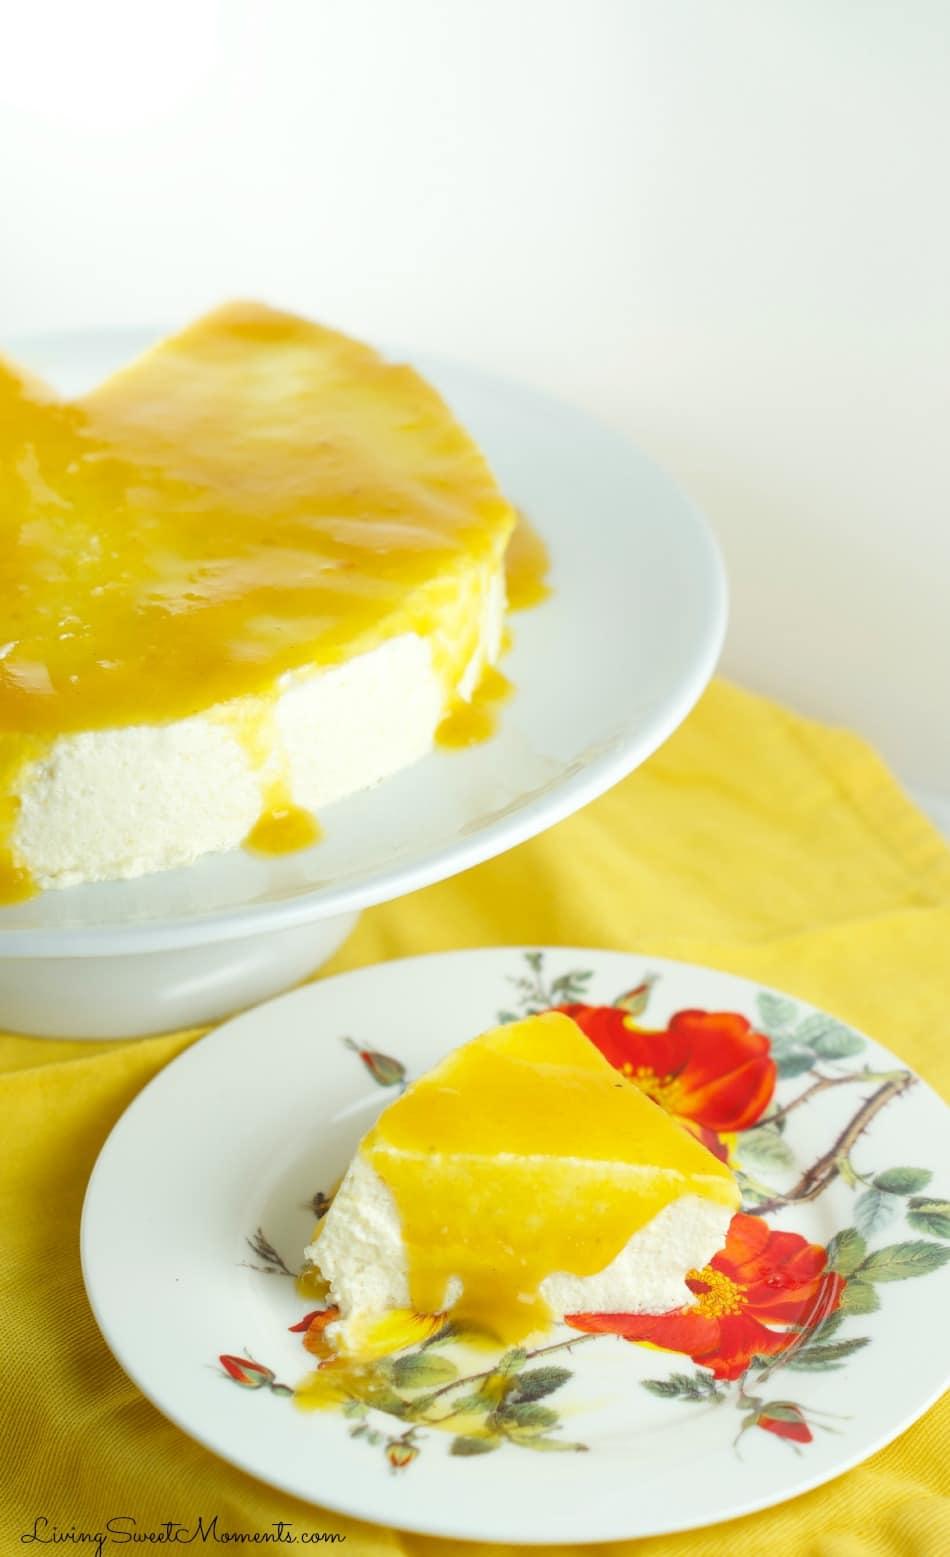 passion-fruit-mousse-recipe-5